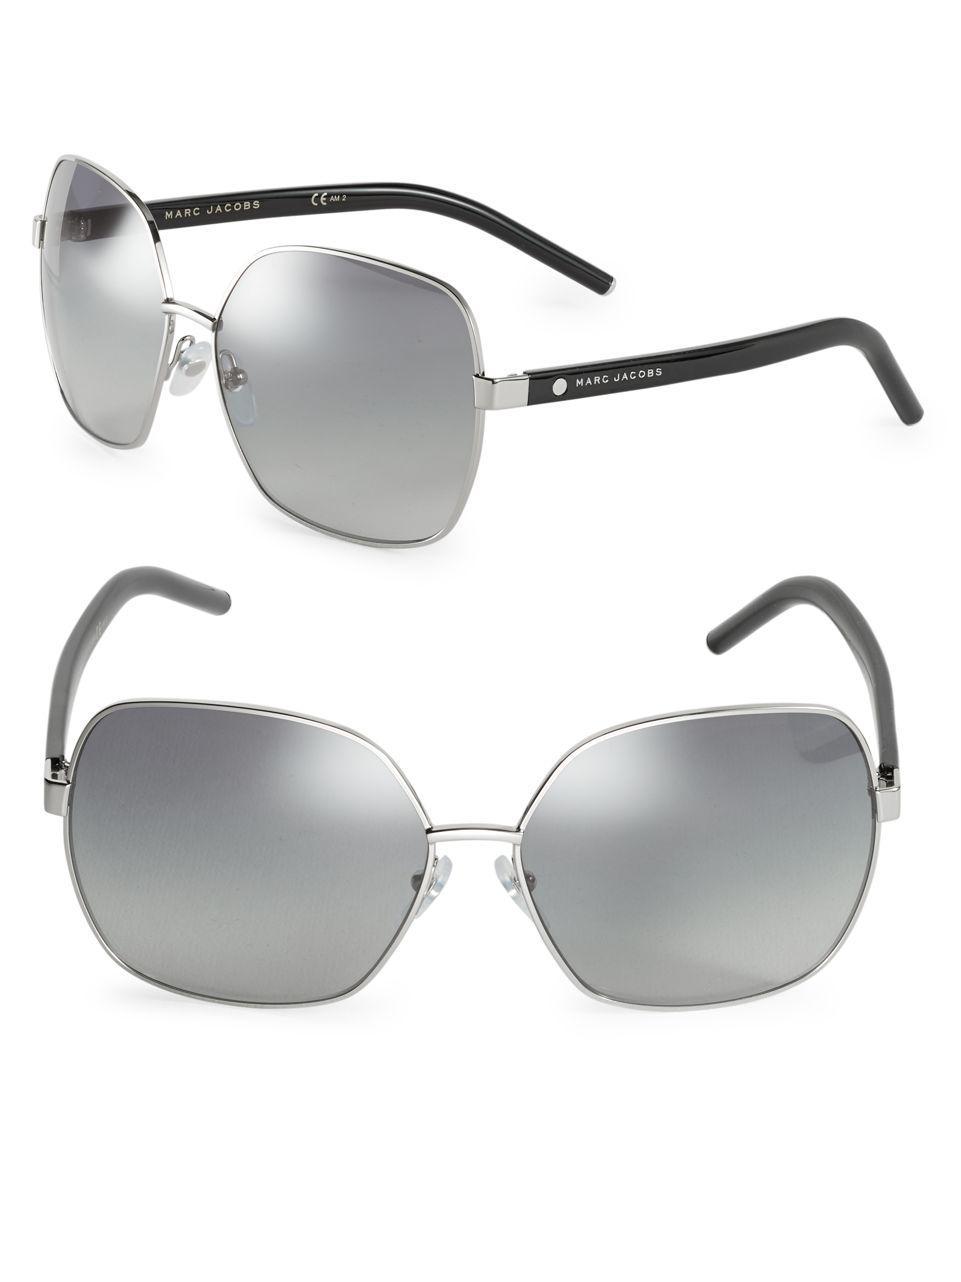 109c329bff1 Marc Jacobs - Metallic 61mm Square Sunglasses - Lyst. View fullscreen